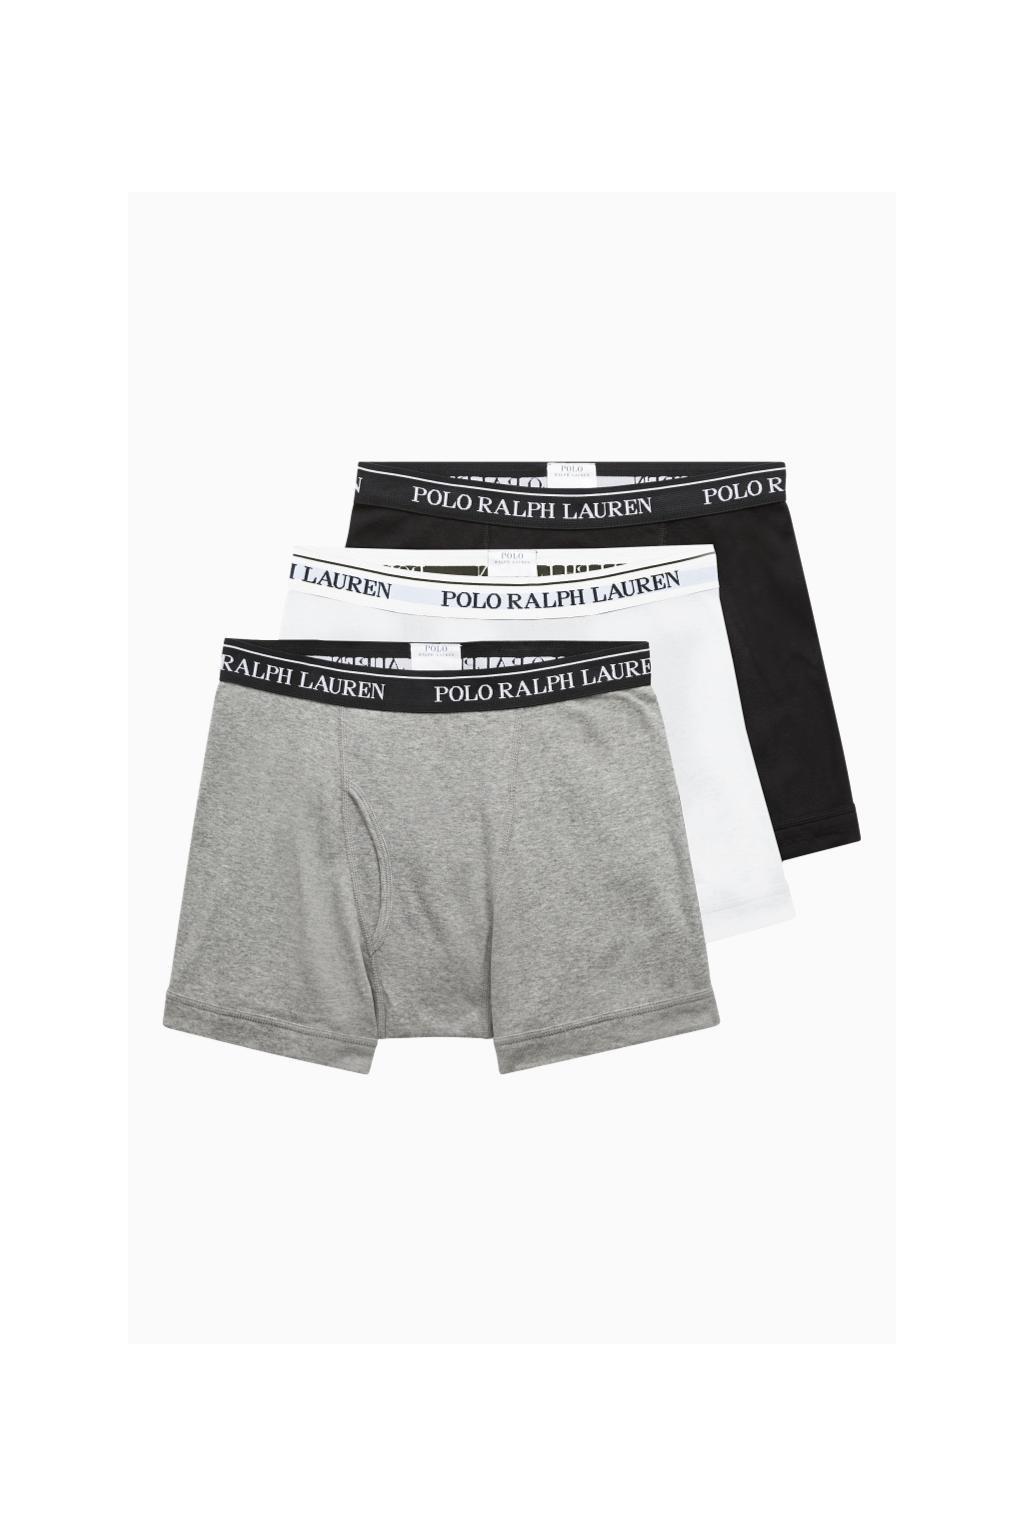 Polo Ralph Lauren boxerky 3- balení - bílá, šedá, černá